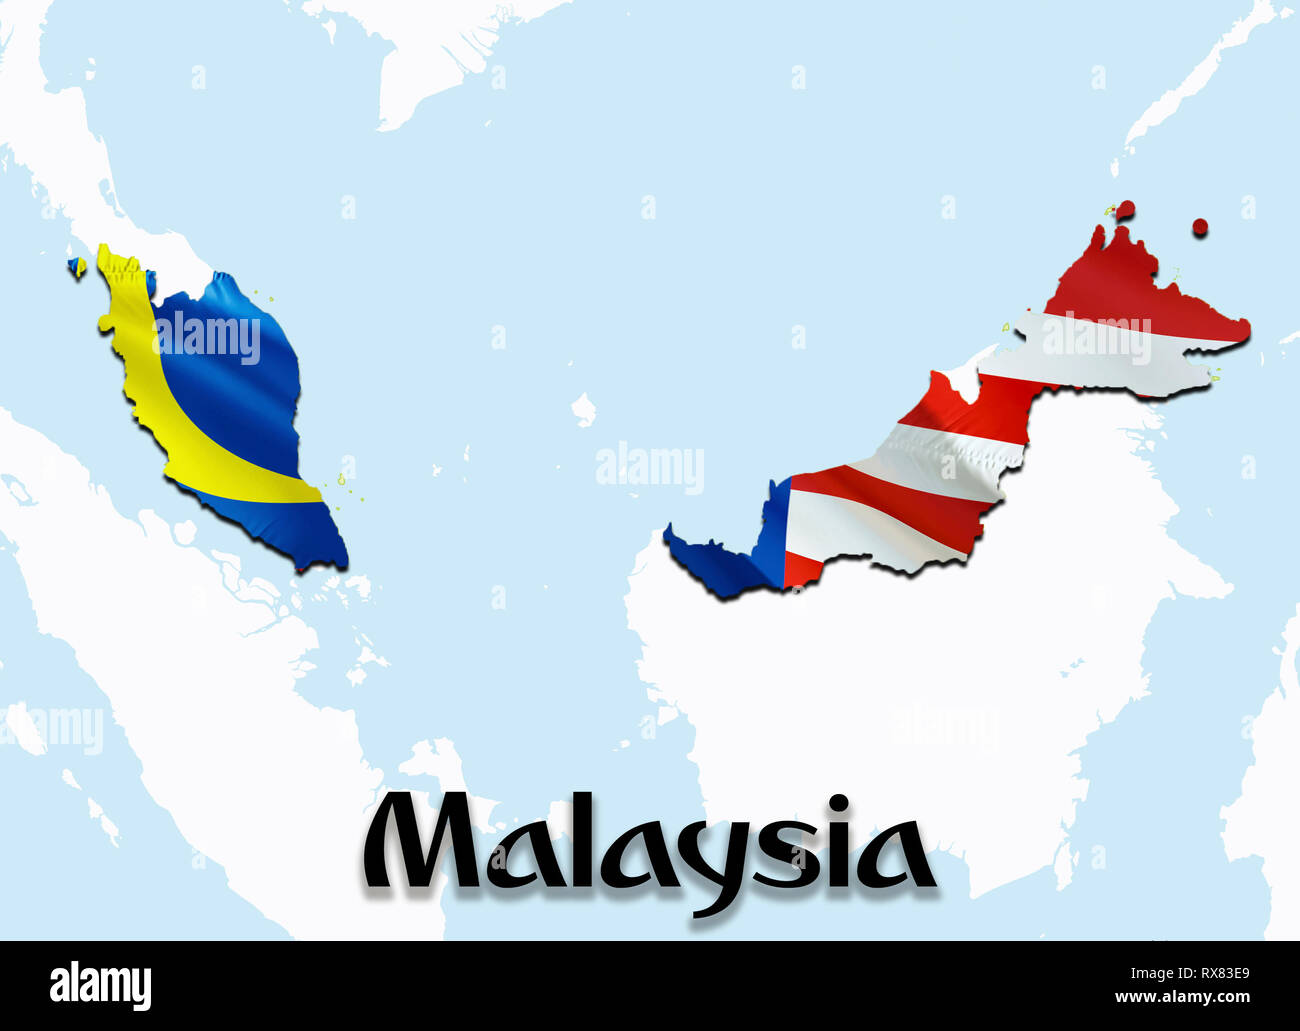 Flag Map of Malaysia. 3D rendering Malaysia map and flag on ... Malaysia Map Image on sarawak map, iran map, pacific islands map, china map, cyprus map, europe map, phillipines map, armenia map, yemen map, kota kinabalu map, world map, australia map, singapore on map, thailand map, united kingdom map, french polynesia map, holland map, japan map, chile map, selangor map, ireland map, georgia map, ukraine map,